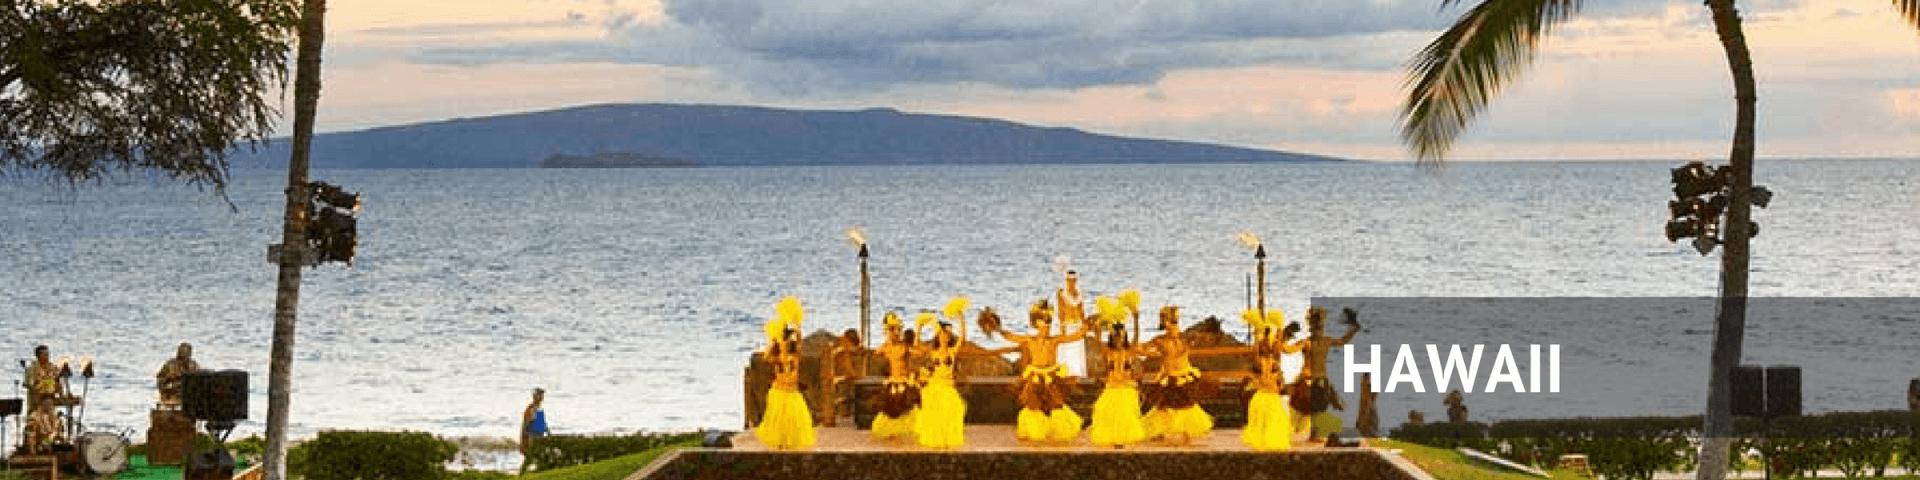 best maui luau 2020 What is the Best Luau in Maui? – Our Maui Luau Reviews